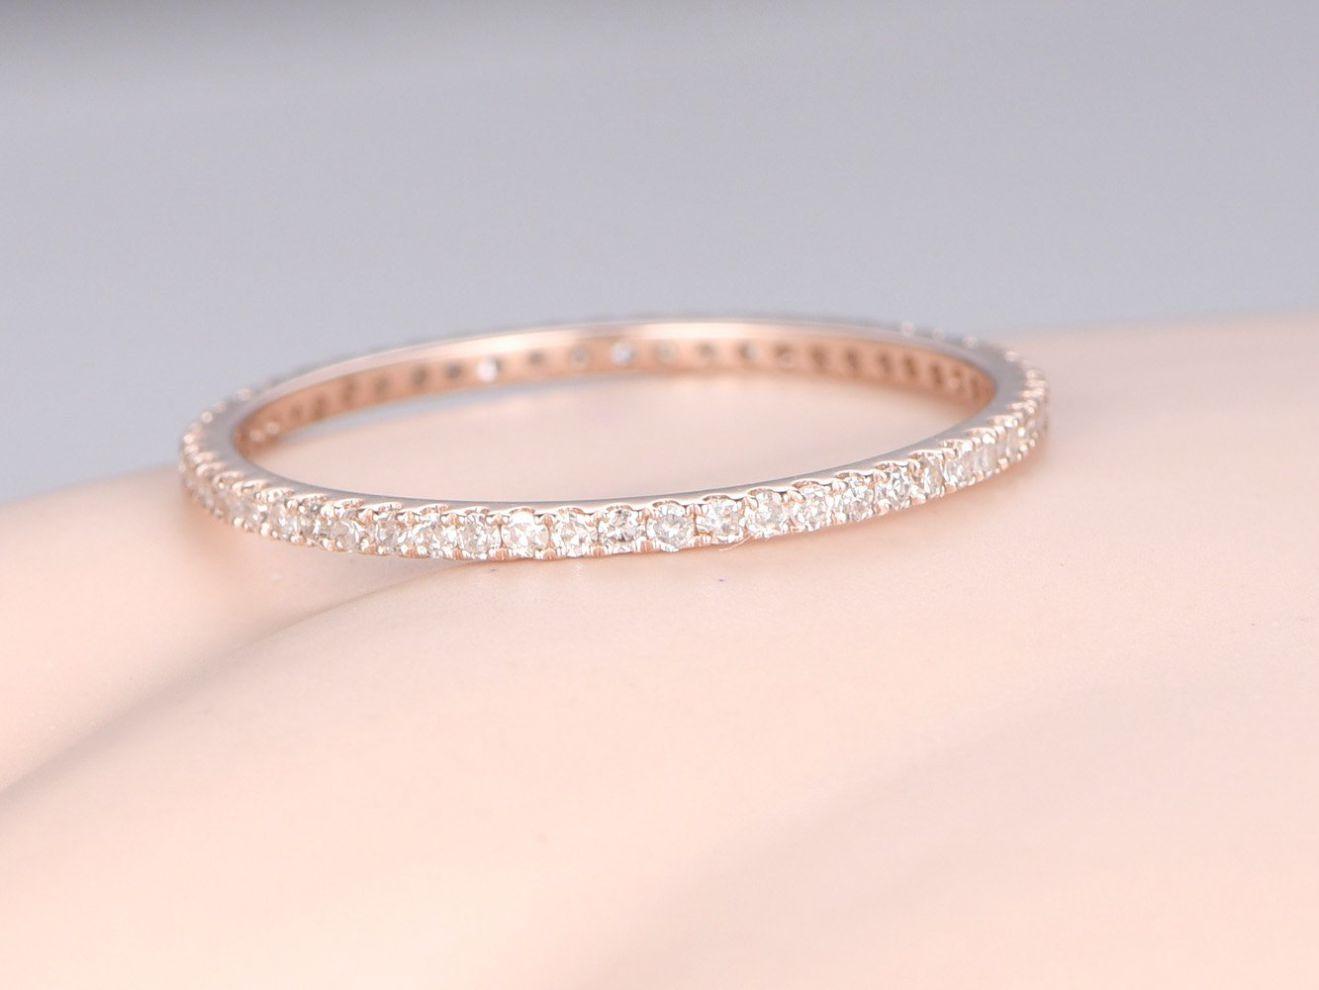 Lalitha Jewellery Gold Exchange As Jewellery Box Target Australia Though Dental Jew Pave Diamond Wedding Bands Minimalist Engagement Ring Eternity Ring Diamond